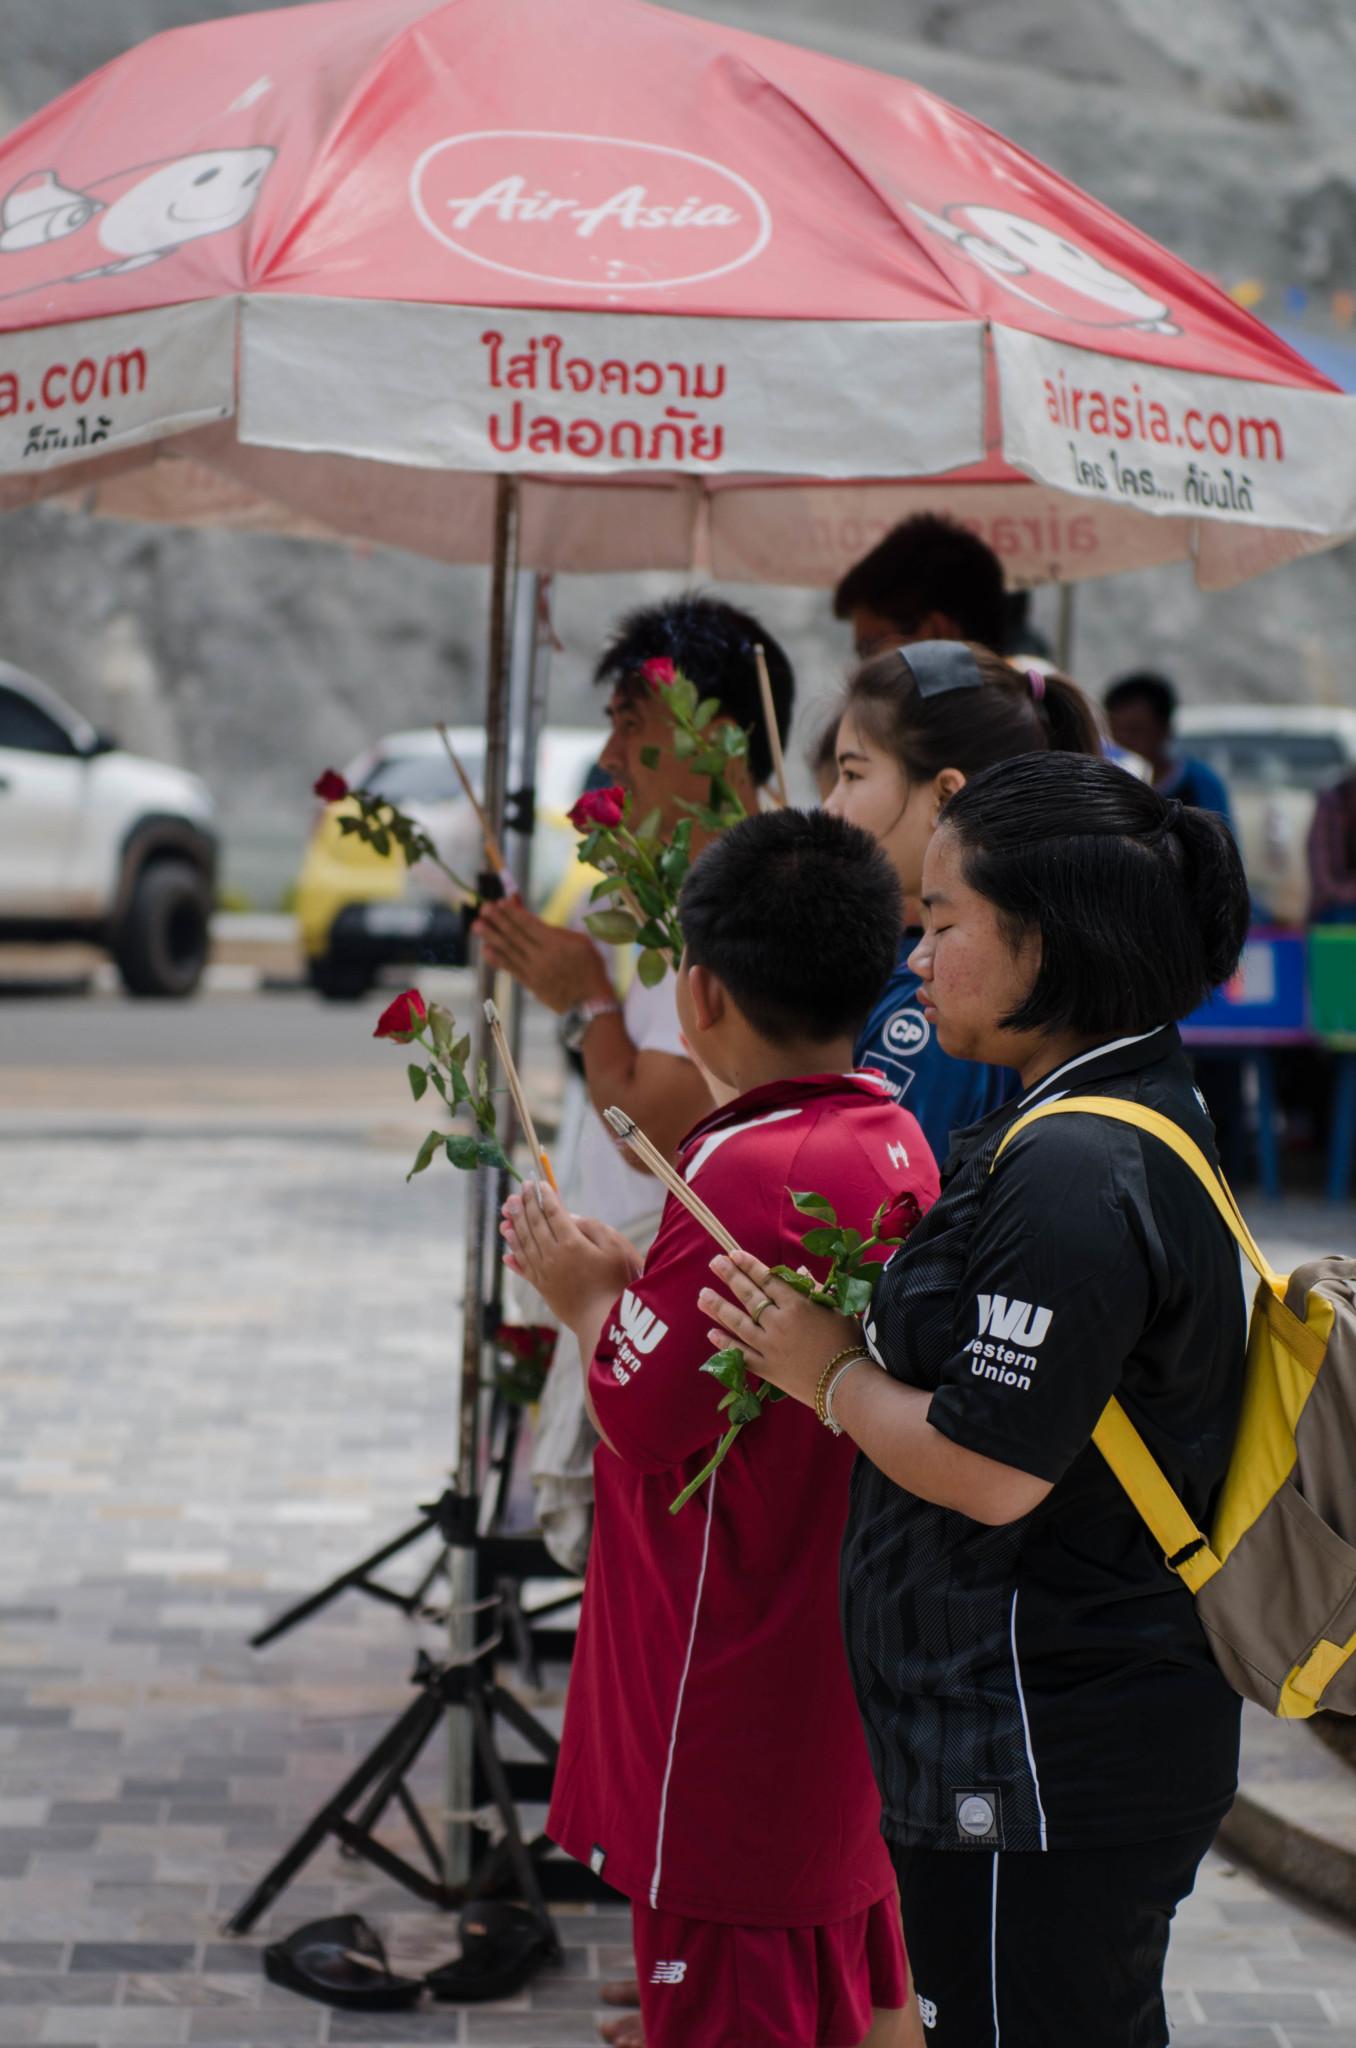 Betende Thais am Sadej Tia Schrein